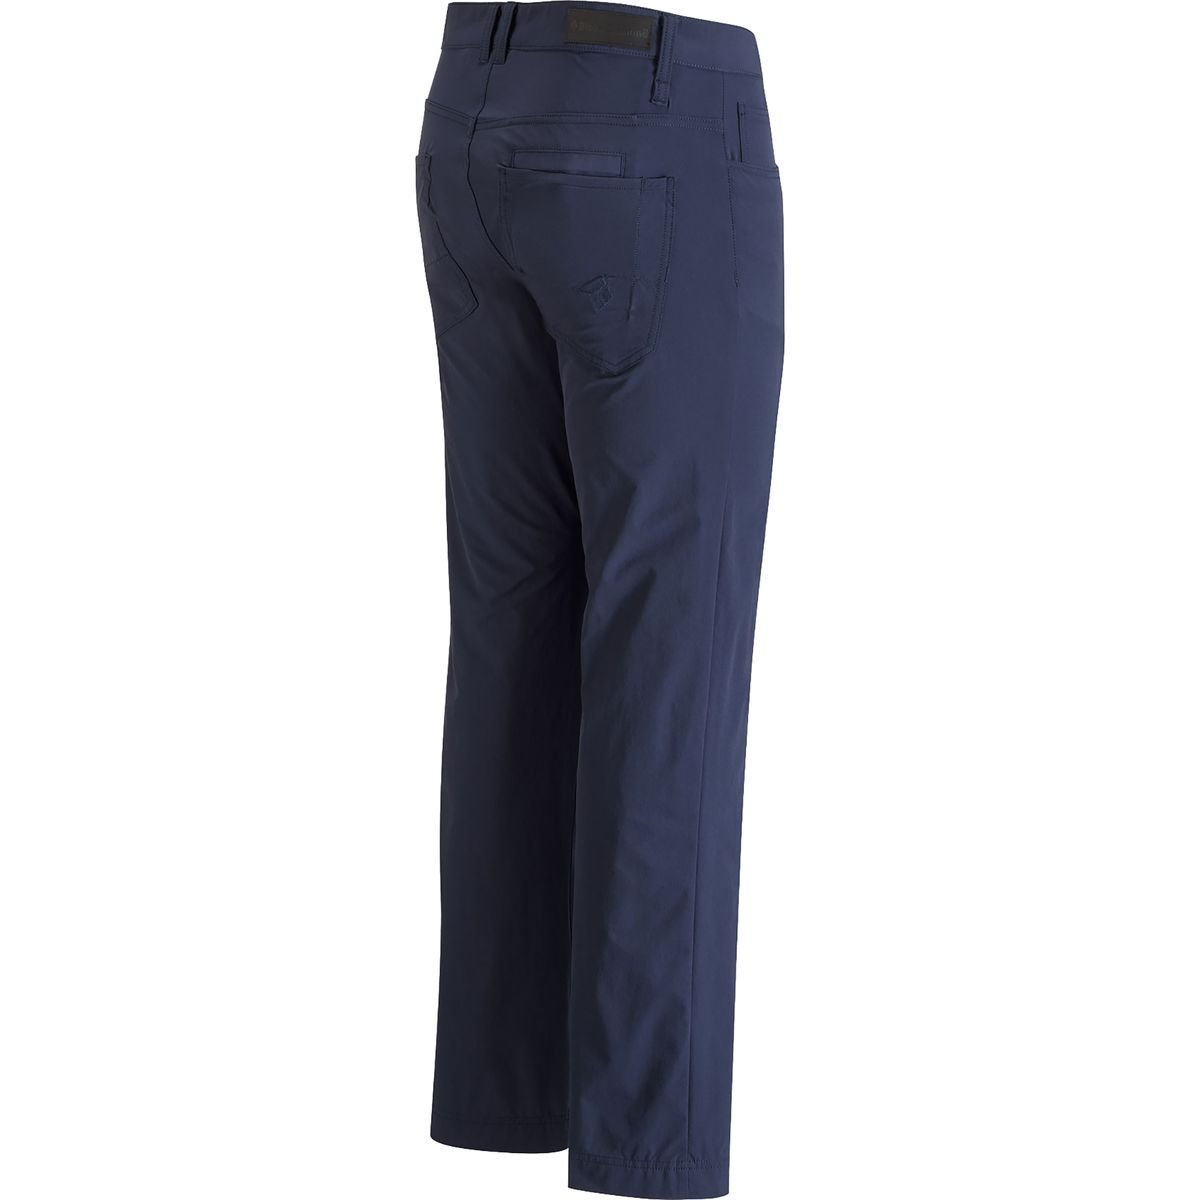 7ab7e5229dfc64 Amazon.com : Black Diamond Men's Modernist Rock Pants : Sports & Outdoors